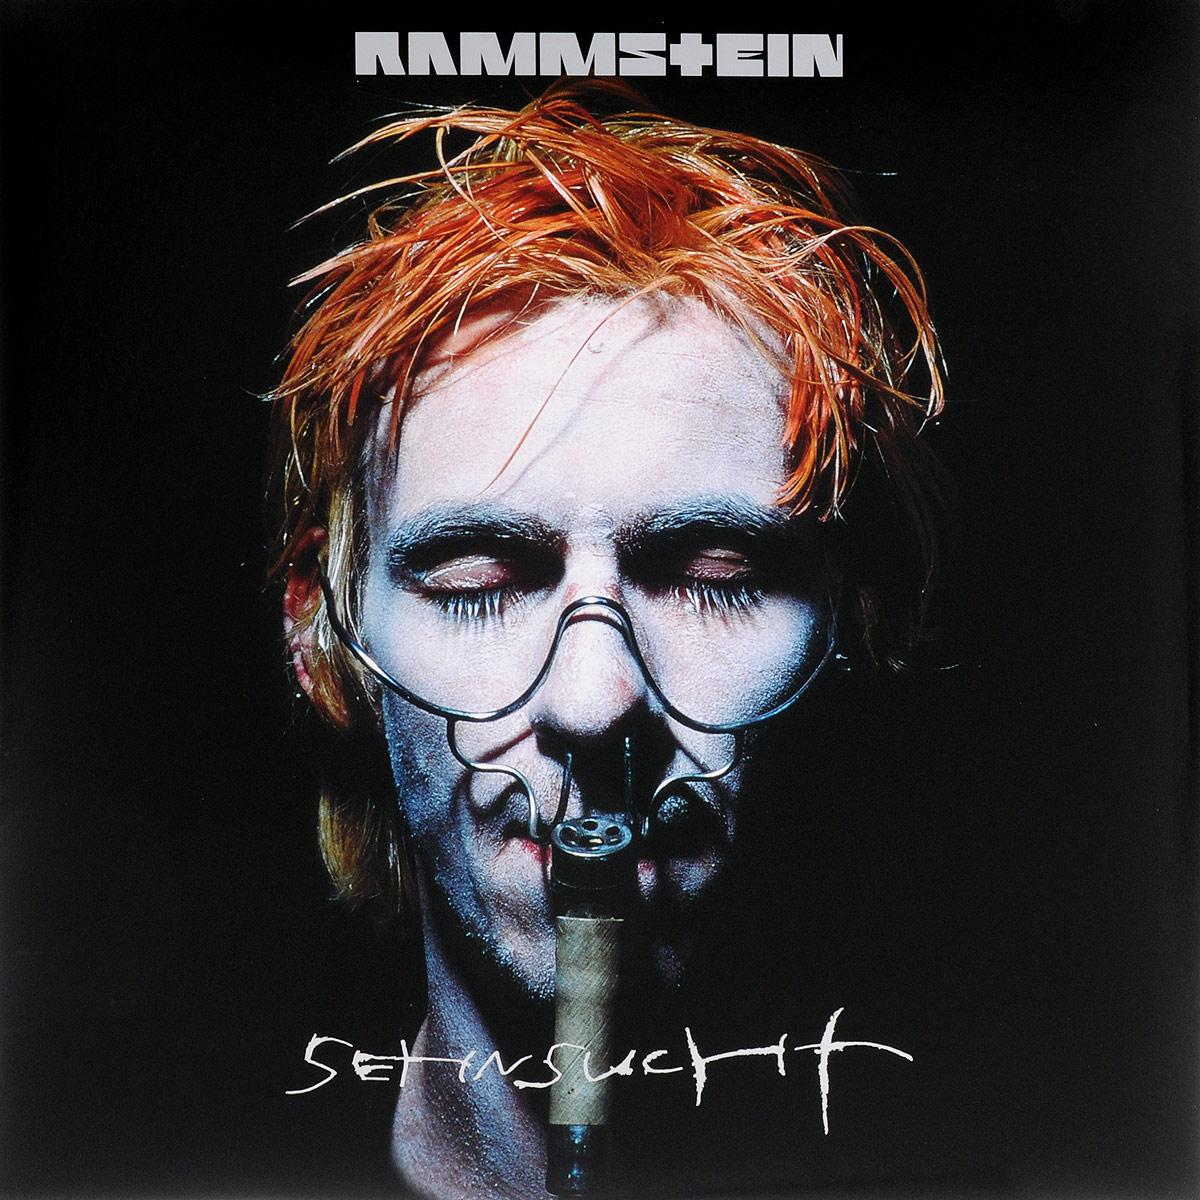 цена на Rammstein Rammstein. Sehnsucht (2 LP)